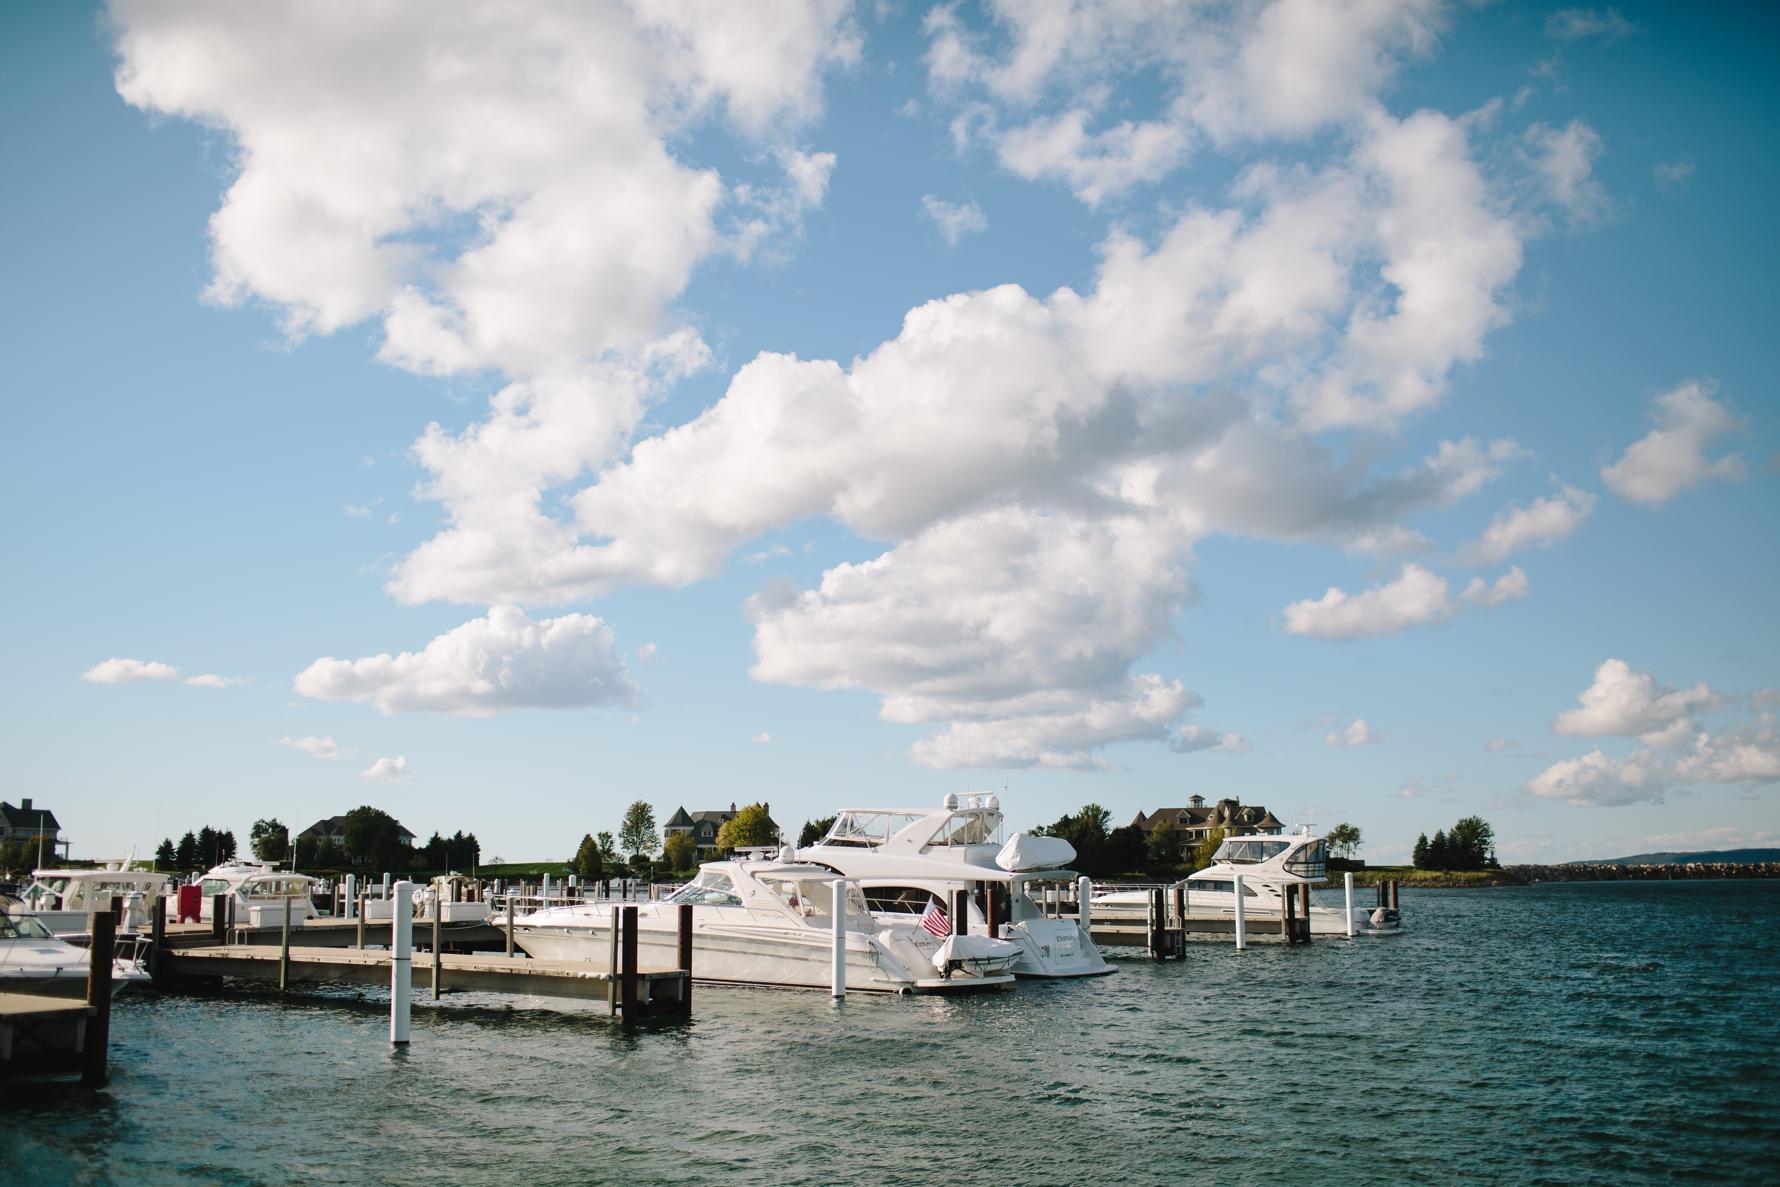 Bay Harbor Yacht Club 058.JPG